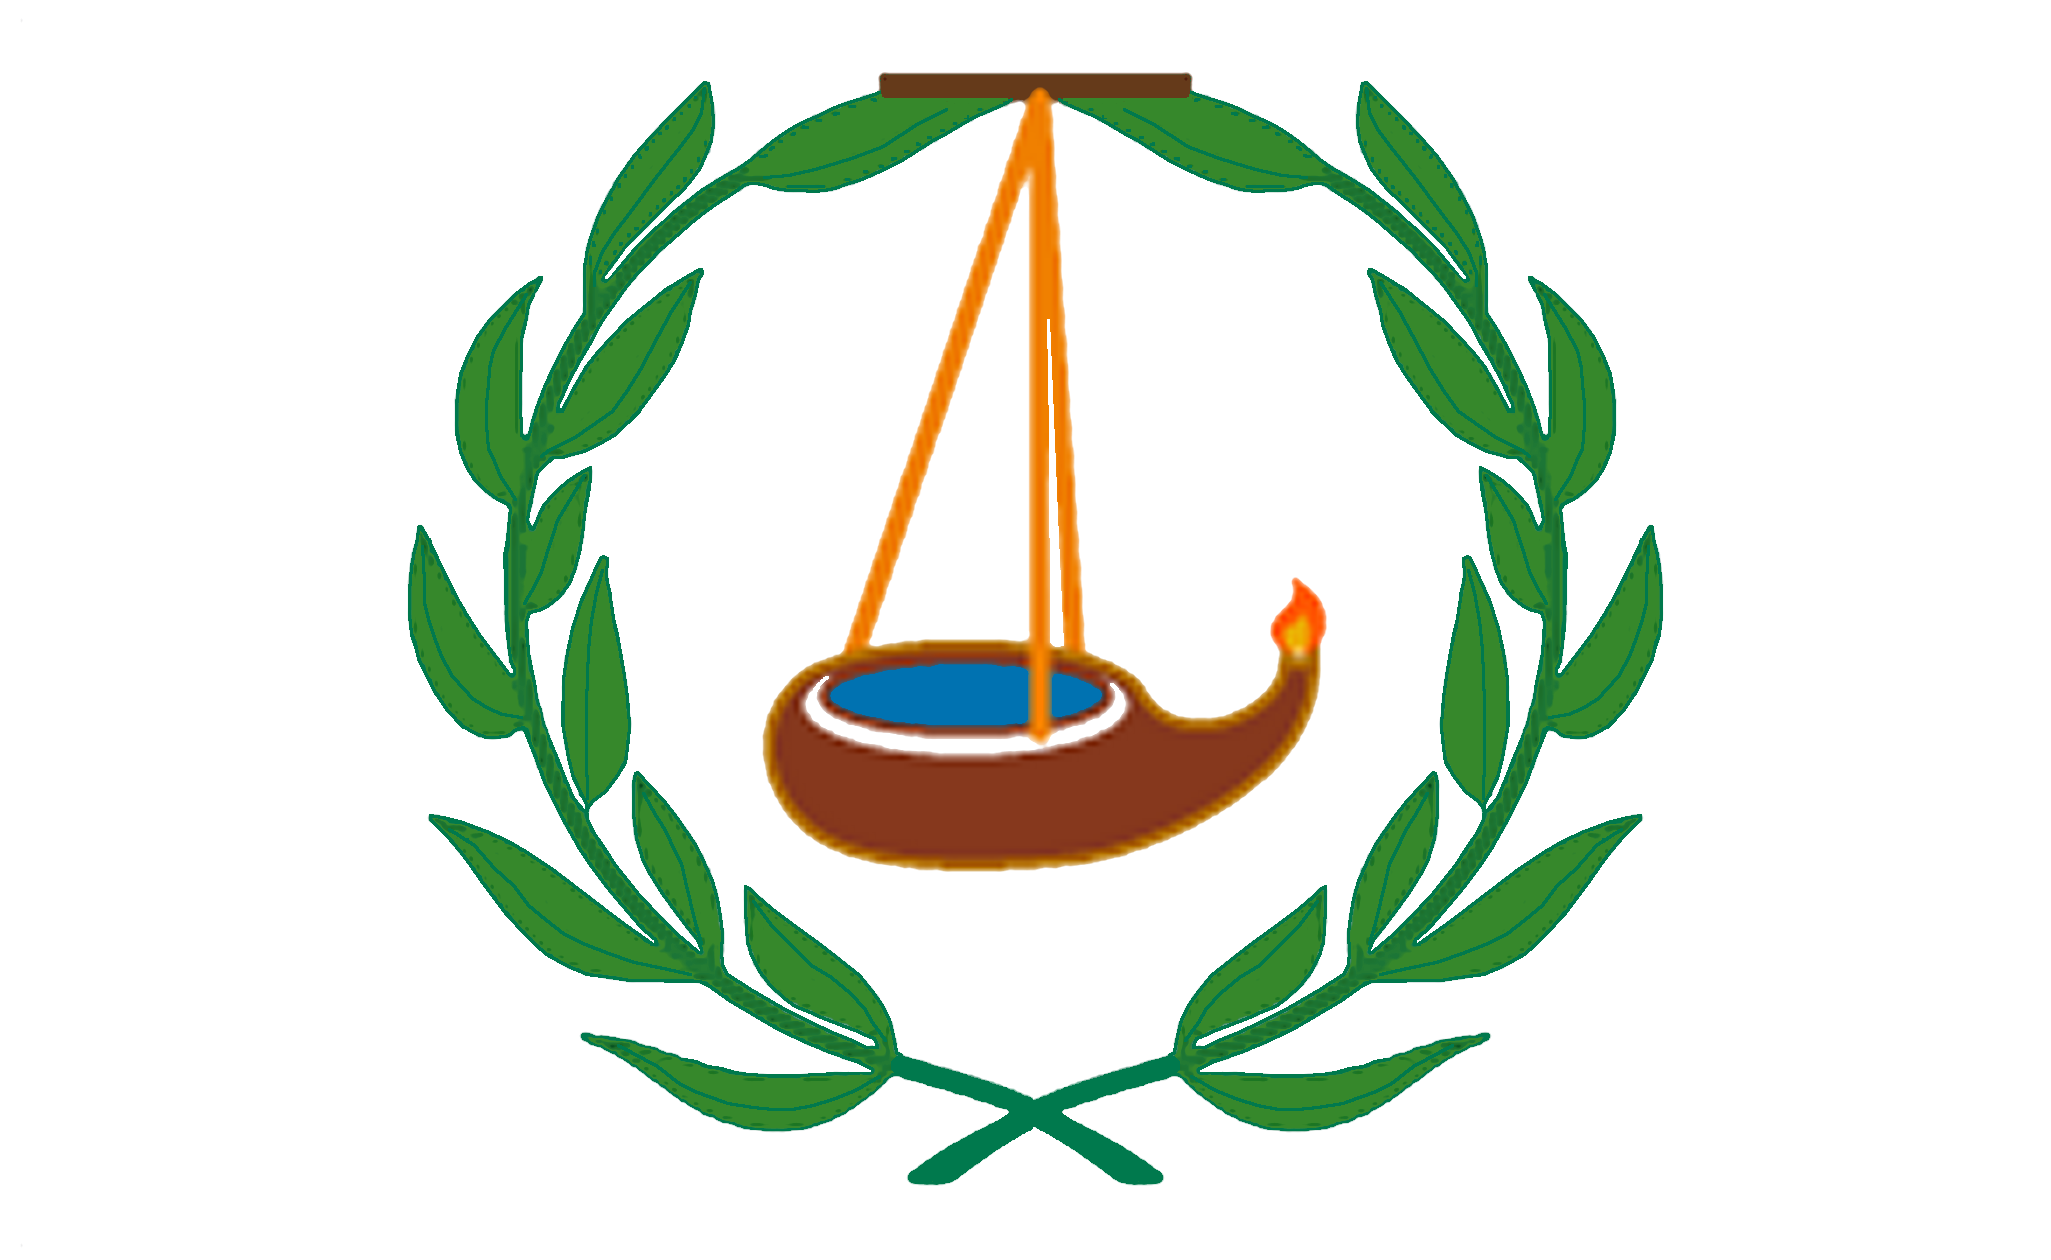 File:Flag of Ngatpang State.png.